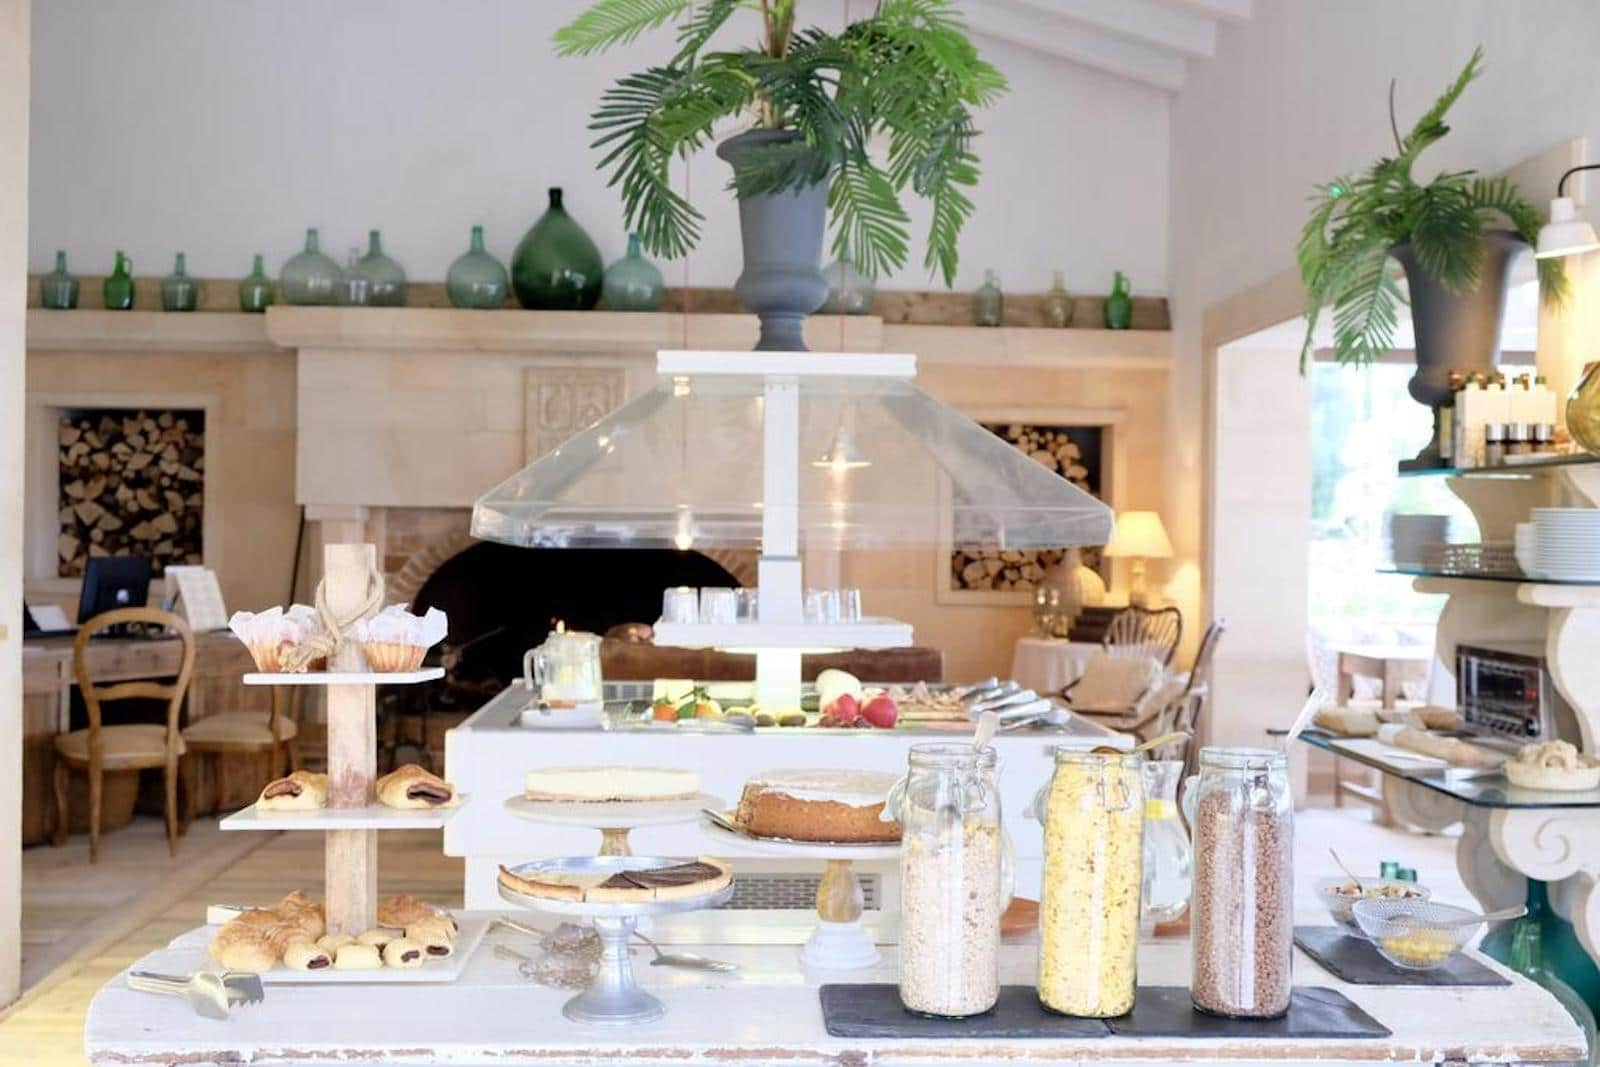 ISLA-Travel-Finca-Hotel-Es-Turo-Mallorca-Breakfast